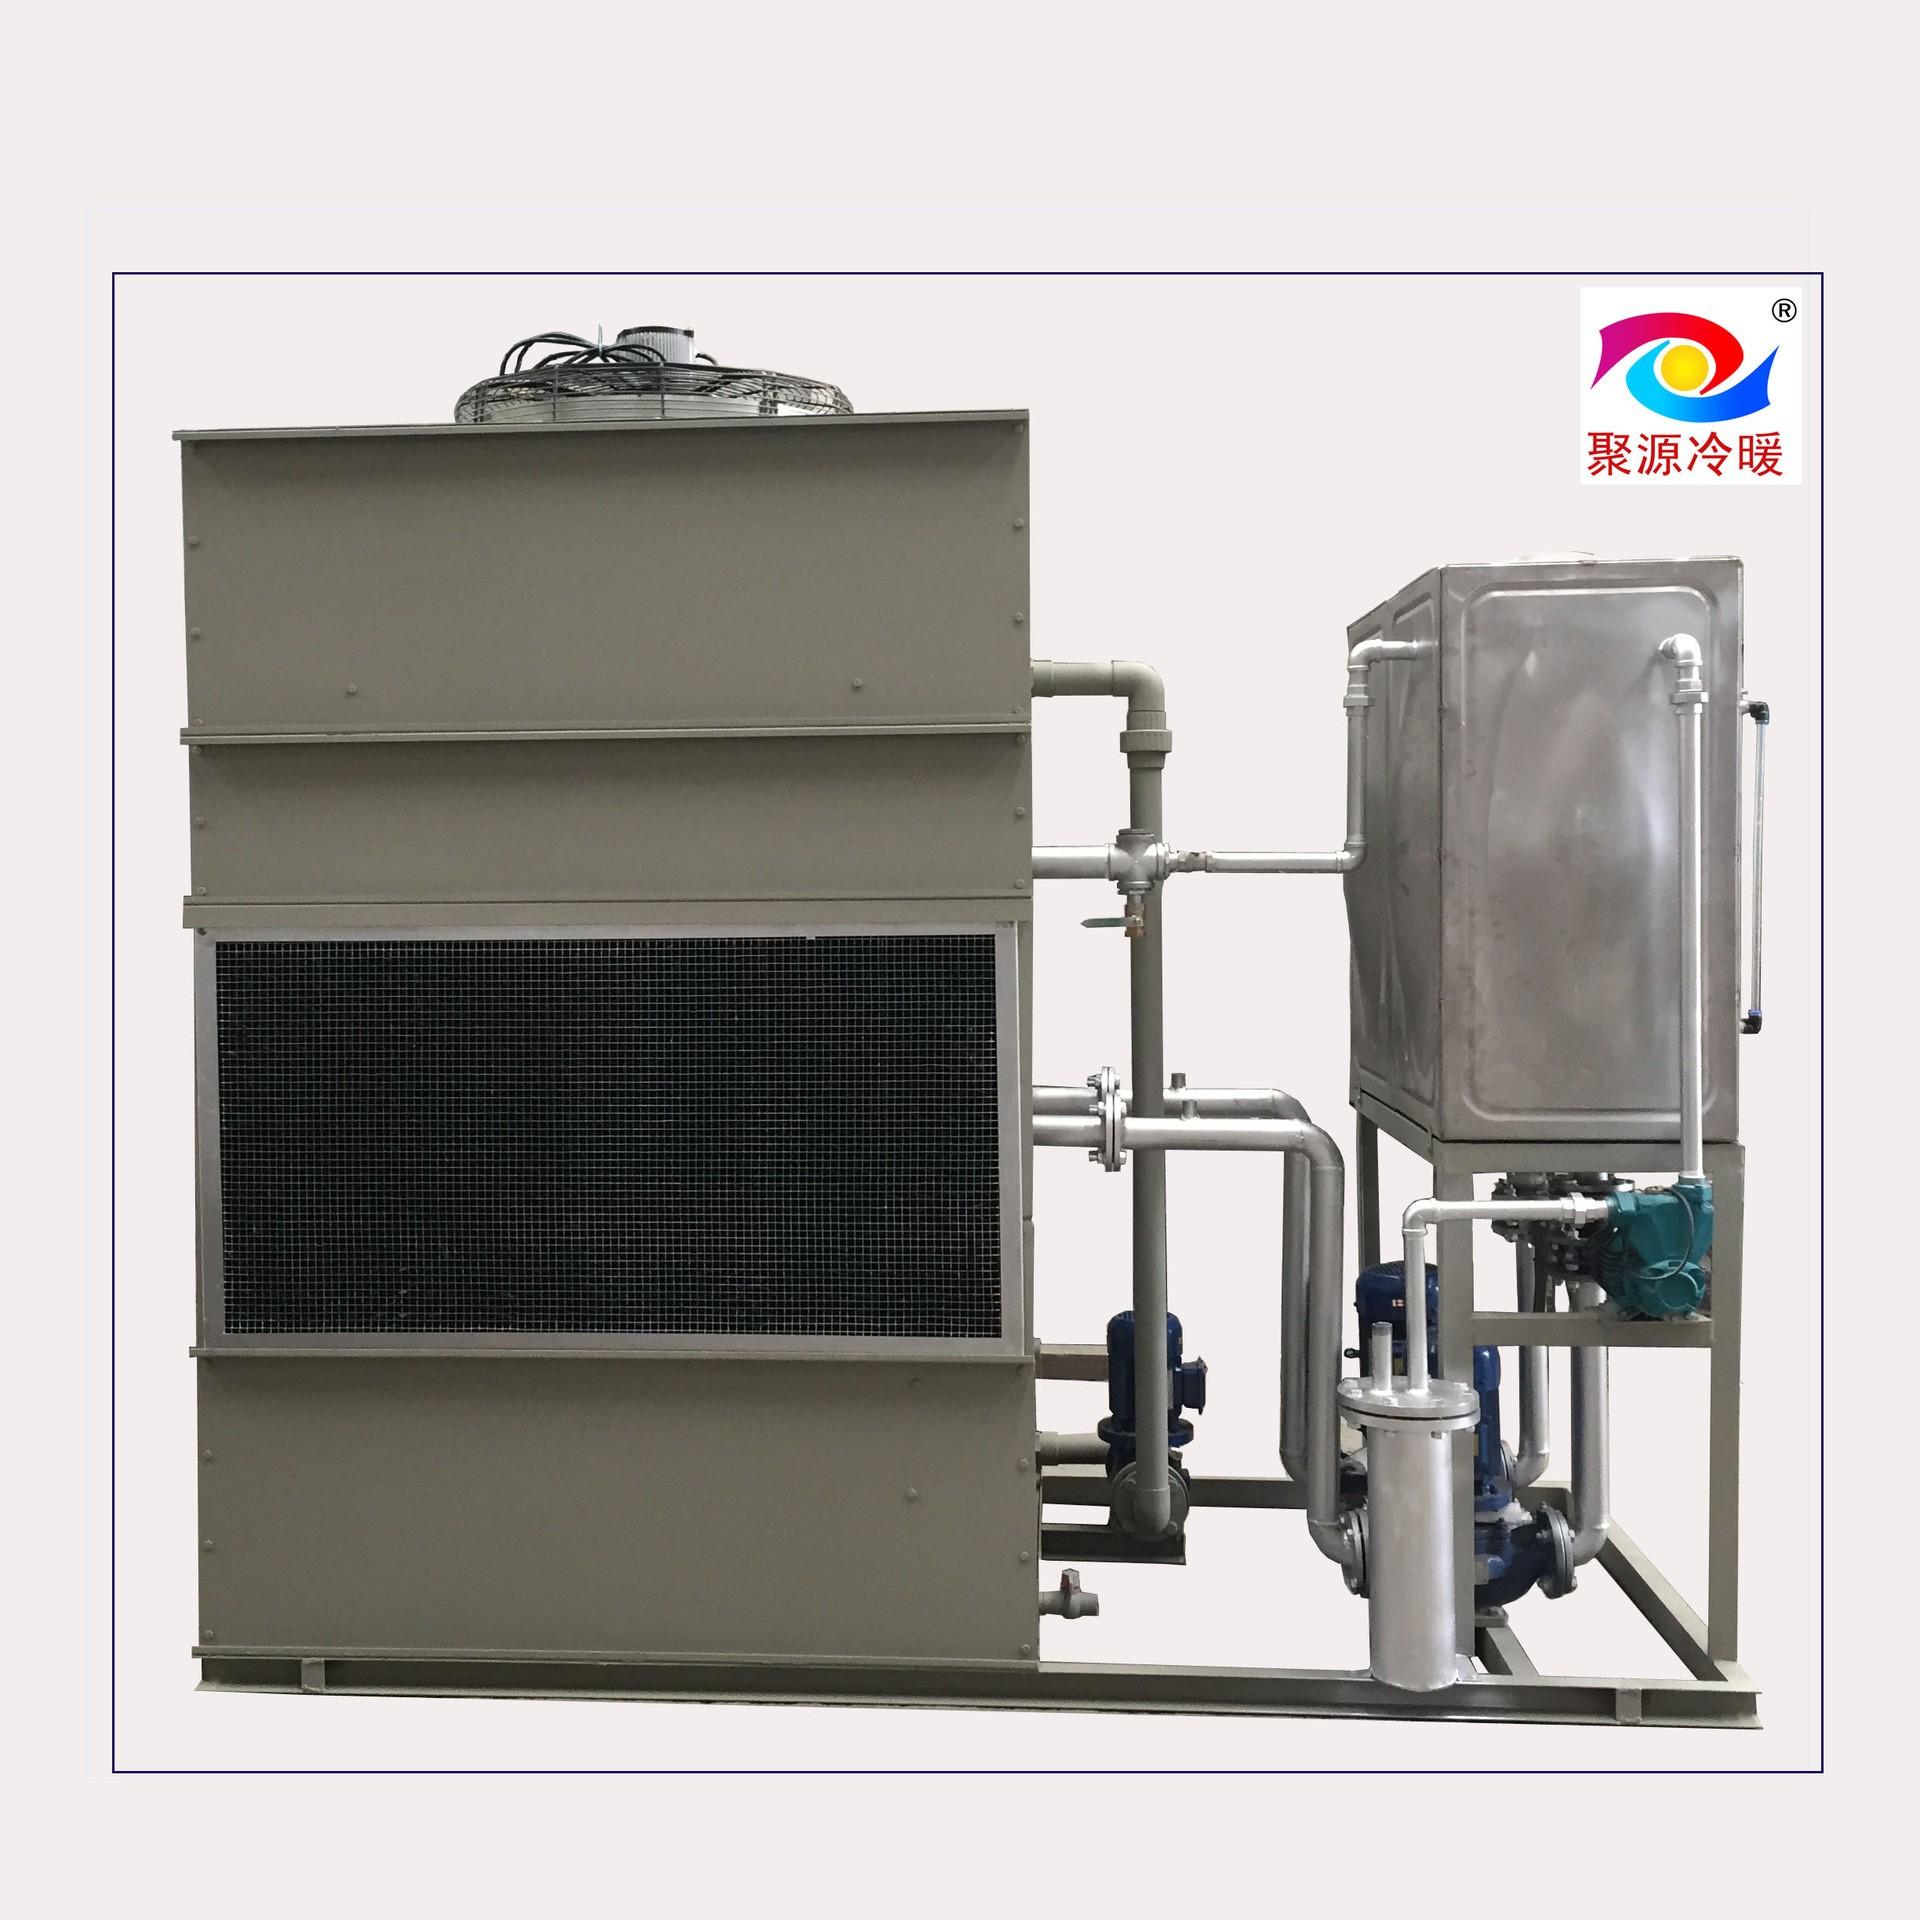 10m3/h空冷器 管式换热器 聚源冷暖 循环水冷却 混合式换热器